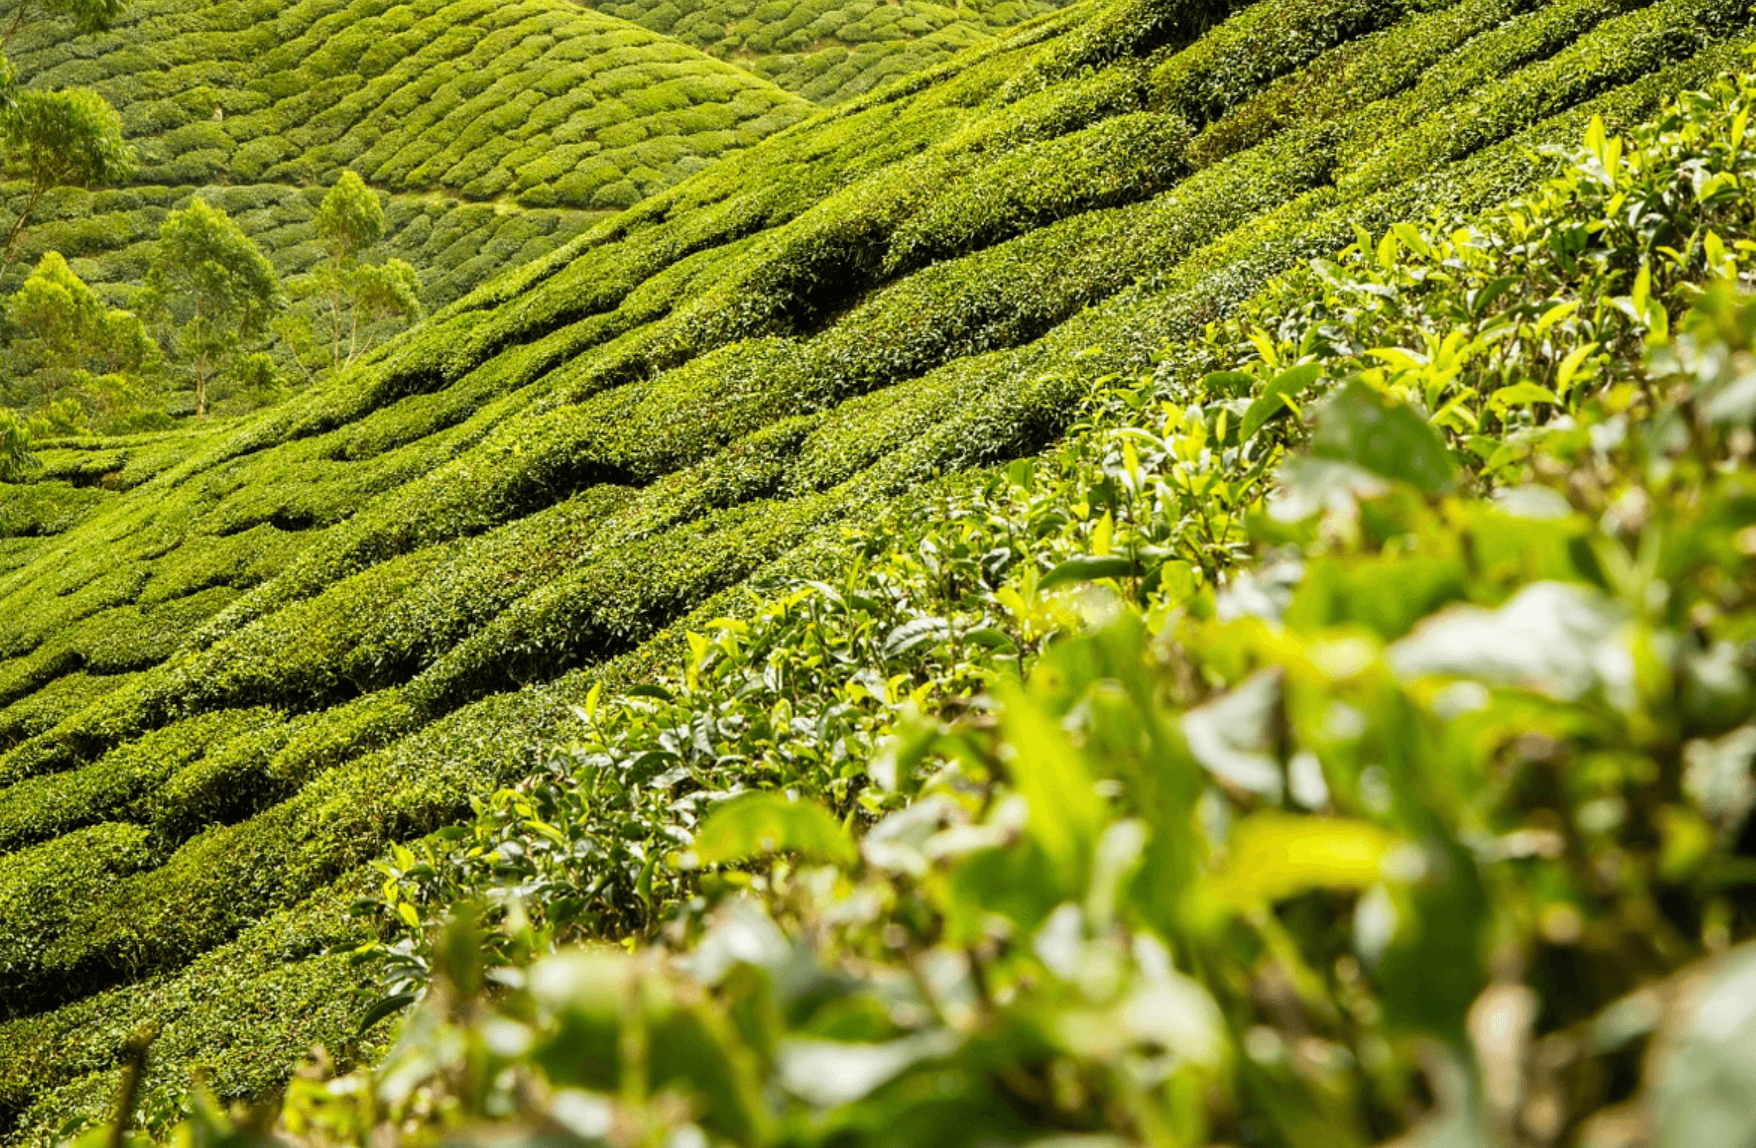 In deze theeplantage groeit verse groene thee